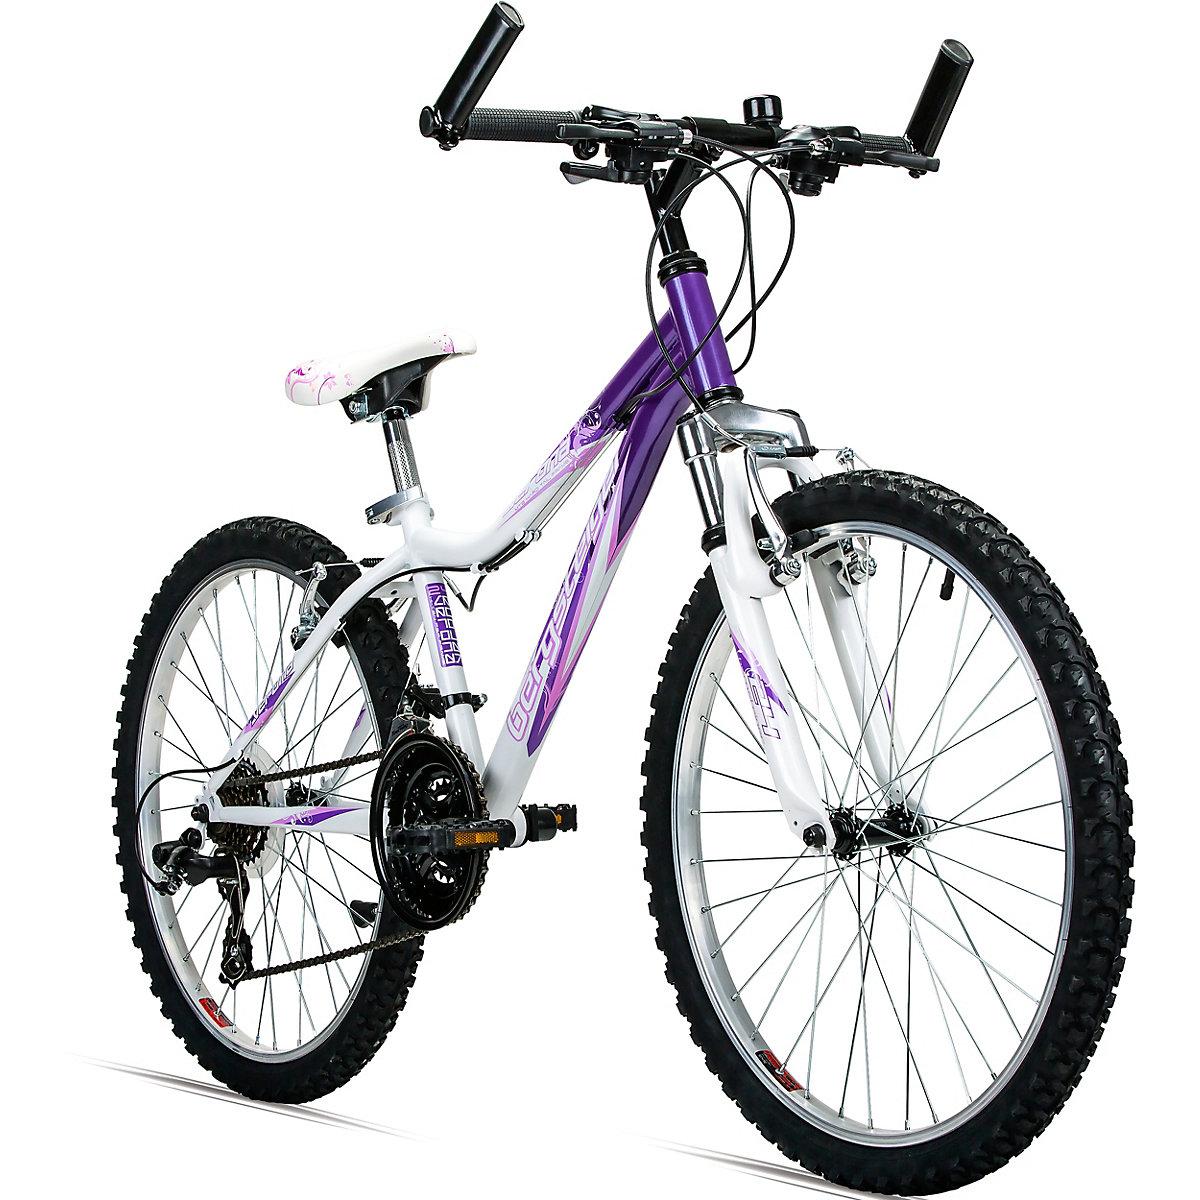 jugendfahrrad mountainbike verona 24 zoll wei lila. Black Bedroom Furniture Sets. Home Design Ideas